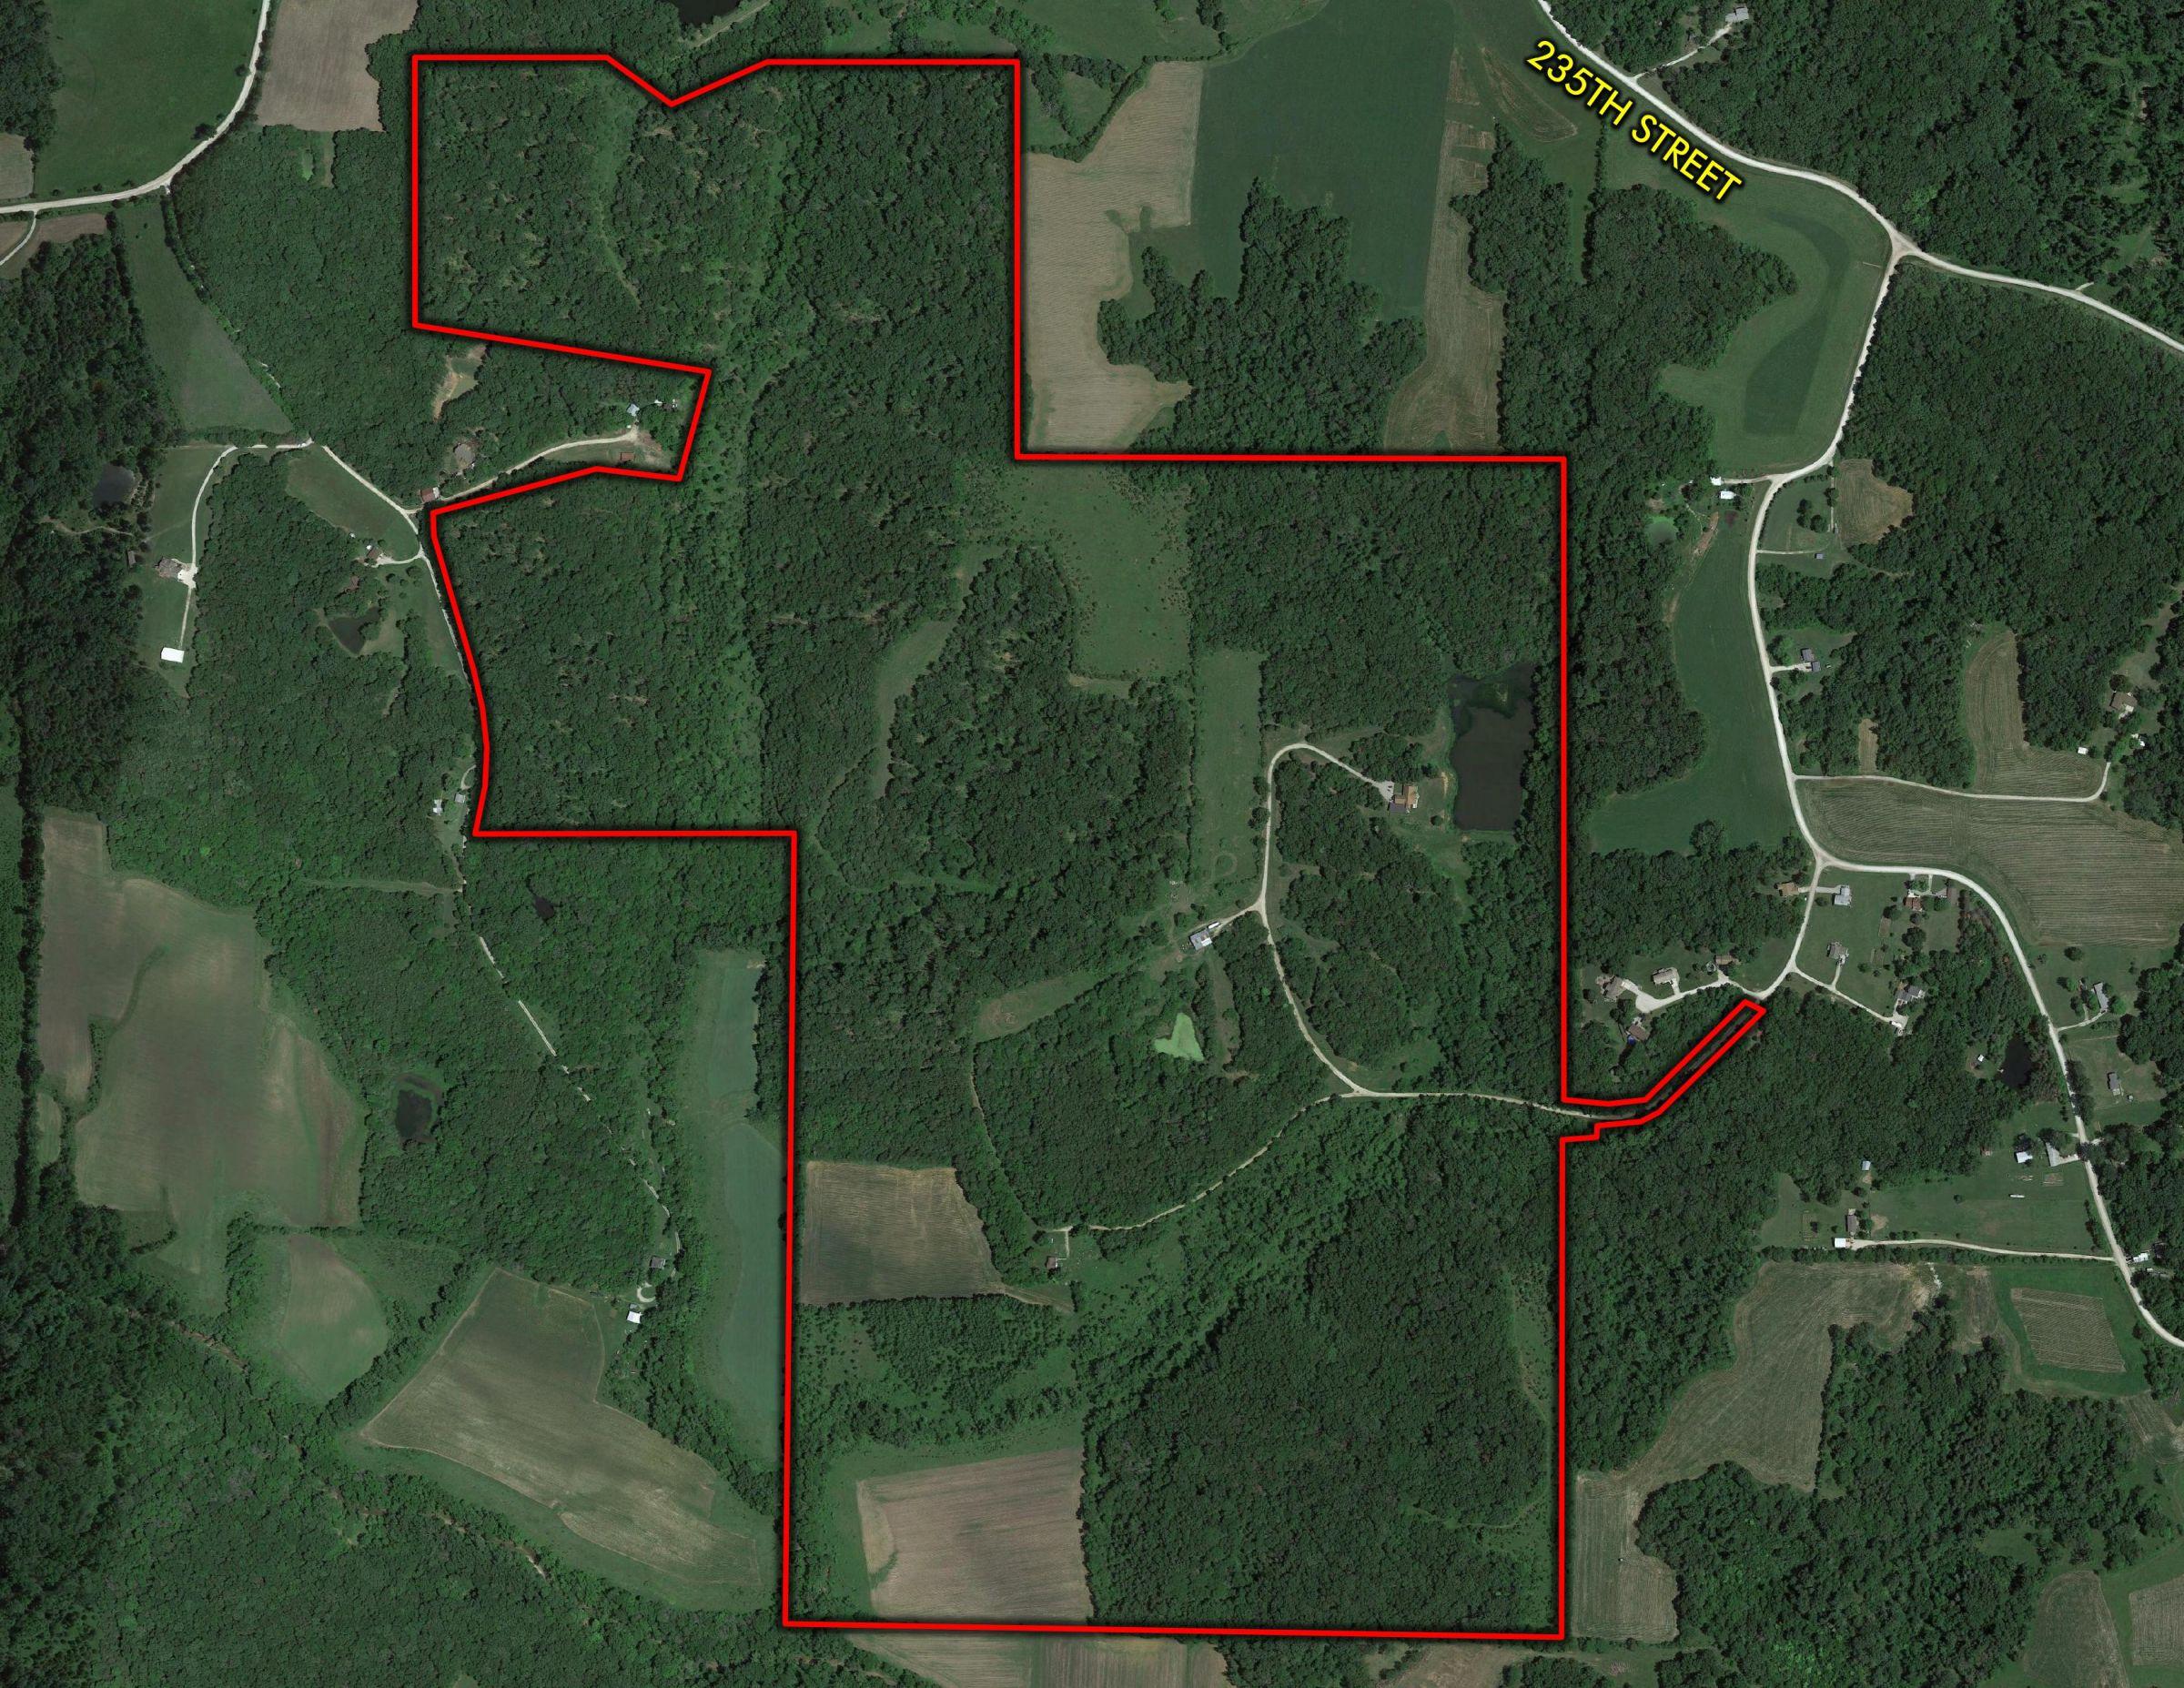 land-lee-county-iowa-328-acres-listing-number-15137-0-2020-08-27-181016.jpg